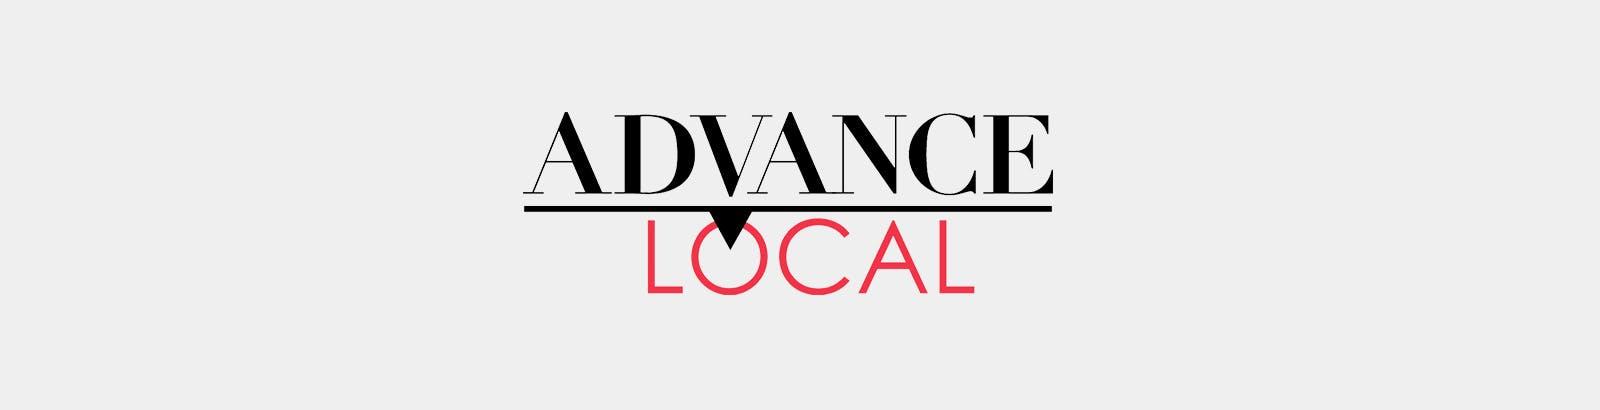 2017 01 23 hero - Publisher Spotlight: Advance Local